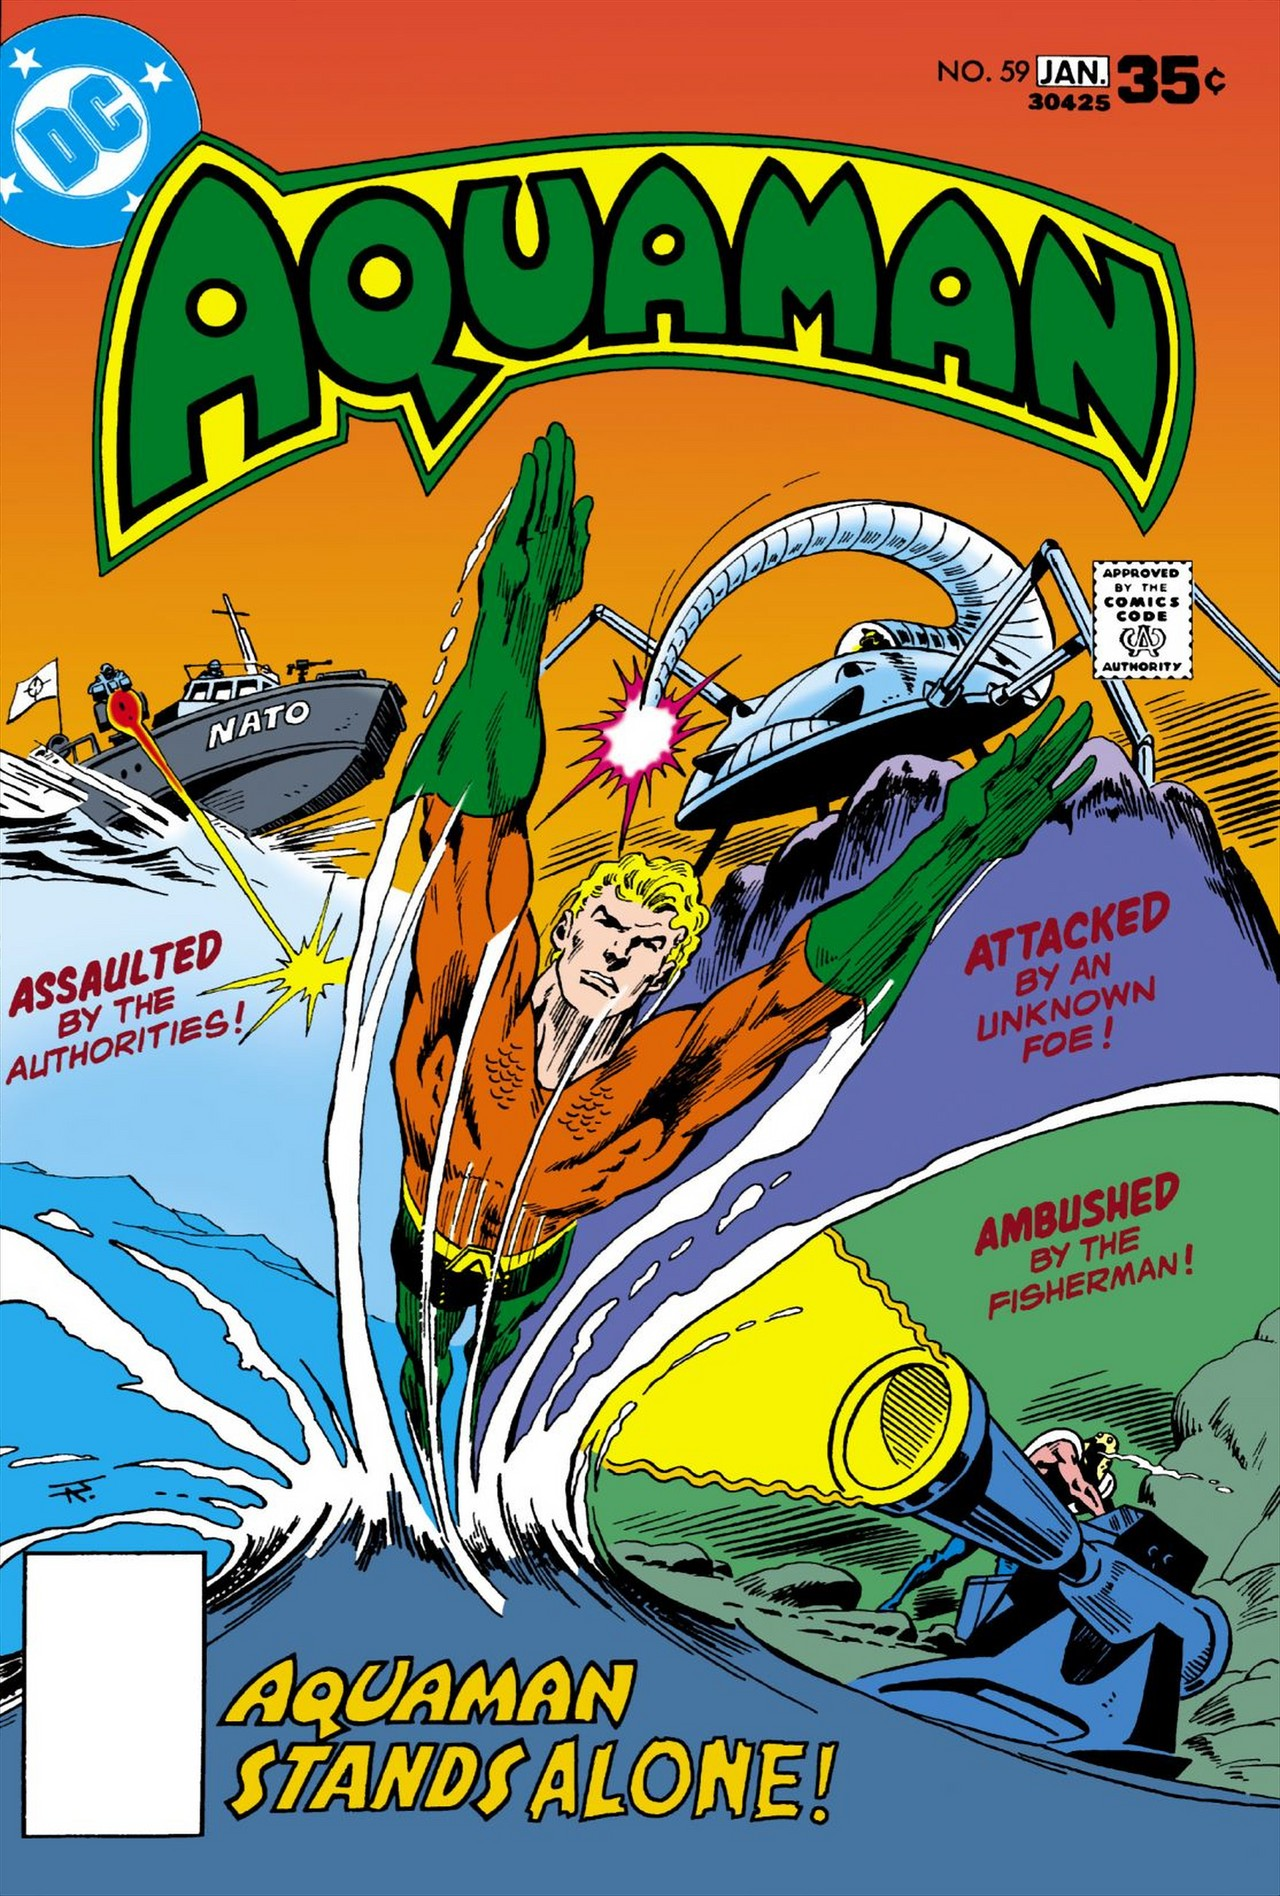 Read online Aquaman (1962) comic -  Issue #59 - 1